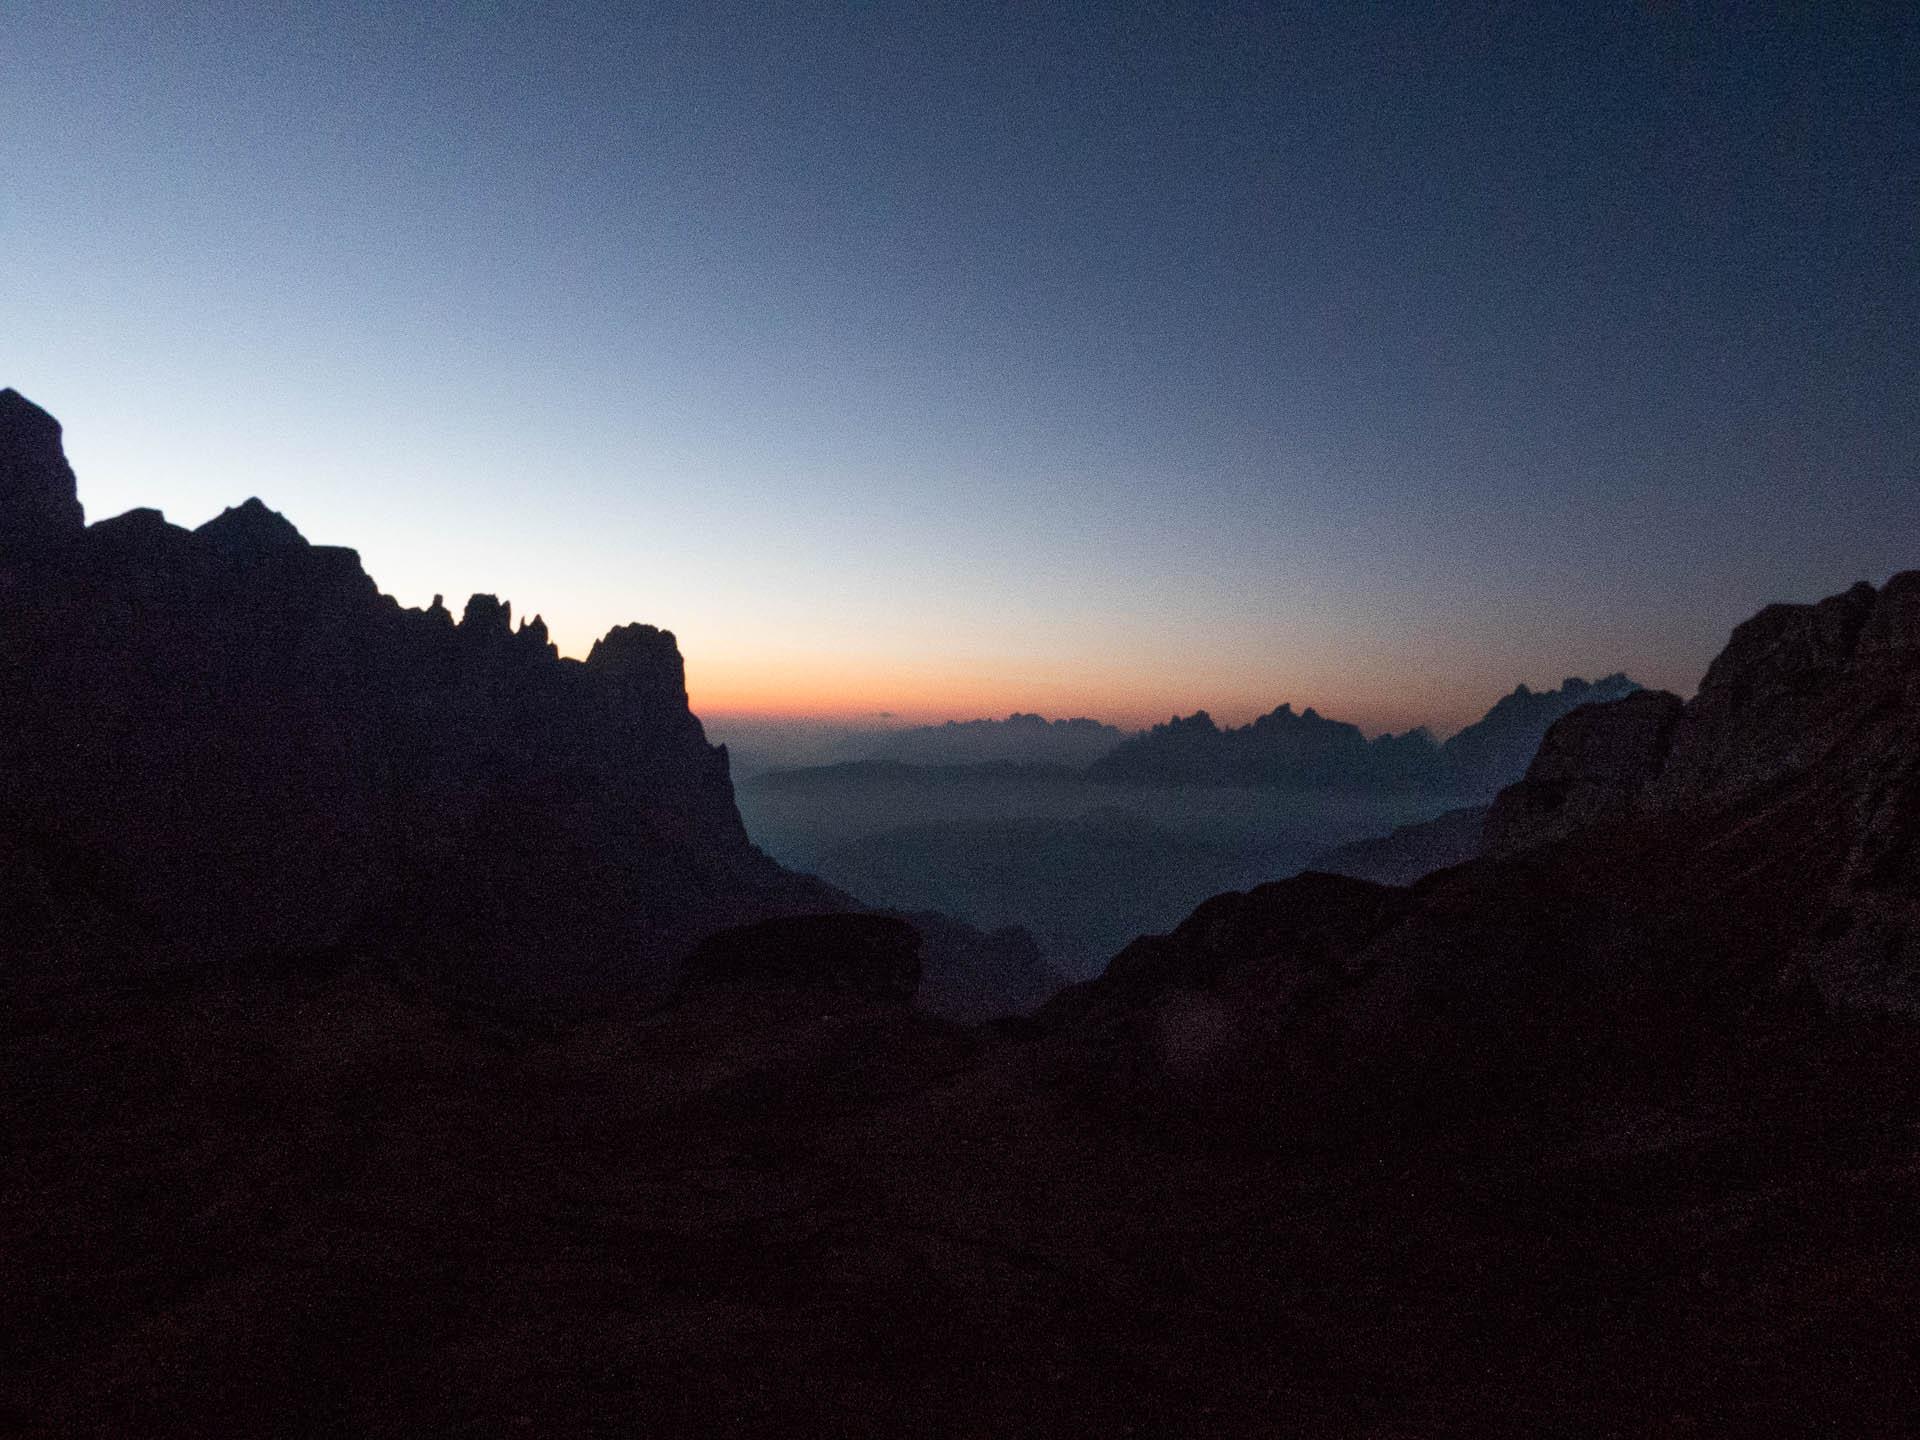 L'alba ci sorprende sopra i laghi di Cengia